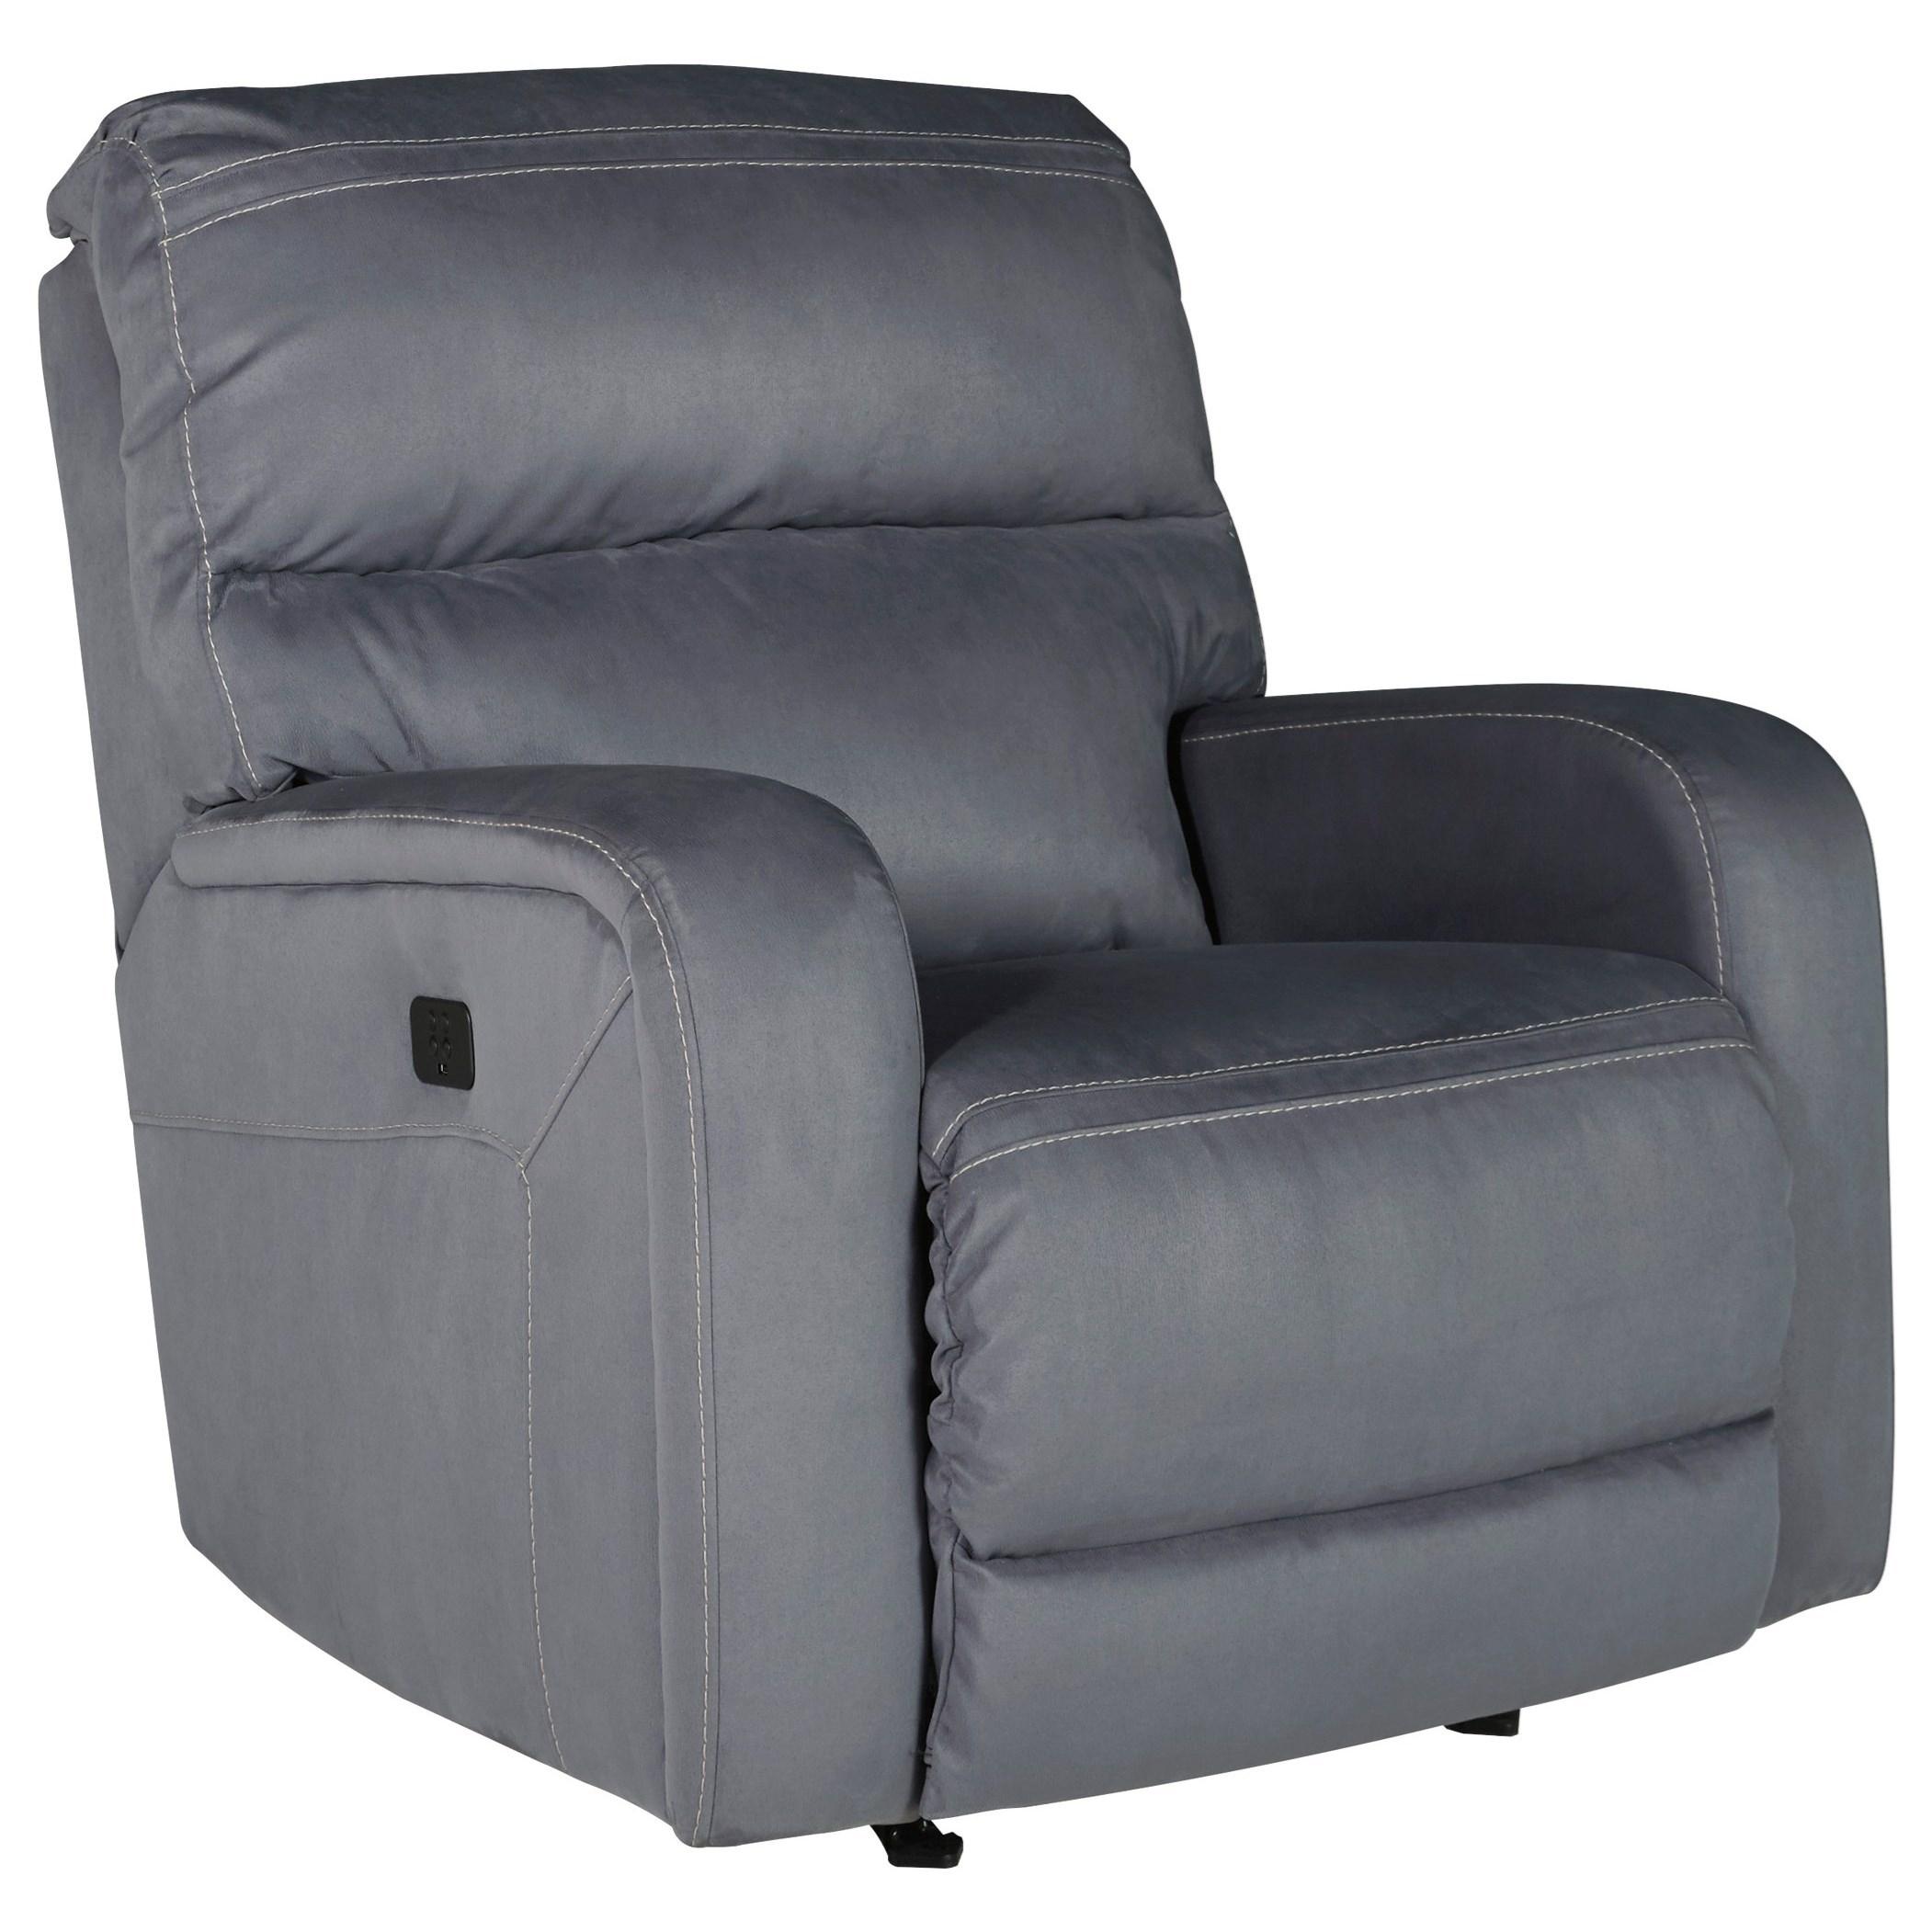 Signature Design by Ashley Azzedella Power Rocker Recliner w/ Adjustable Headrest - Item Number: 7530513